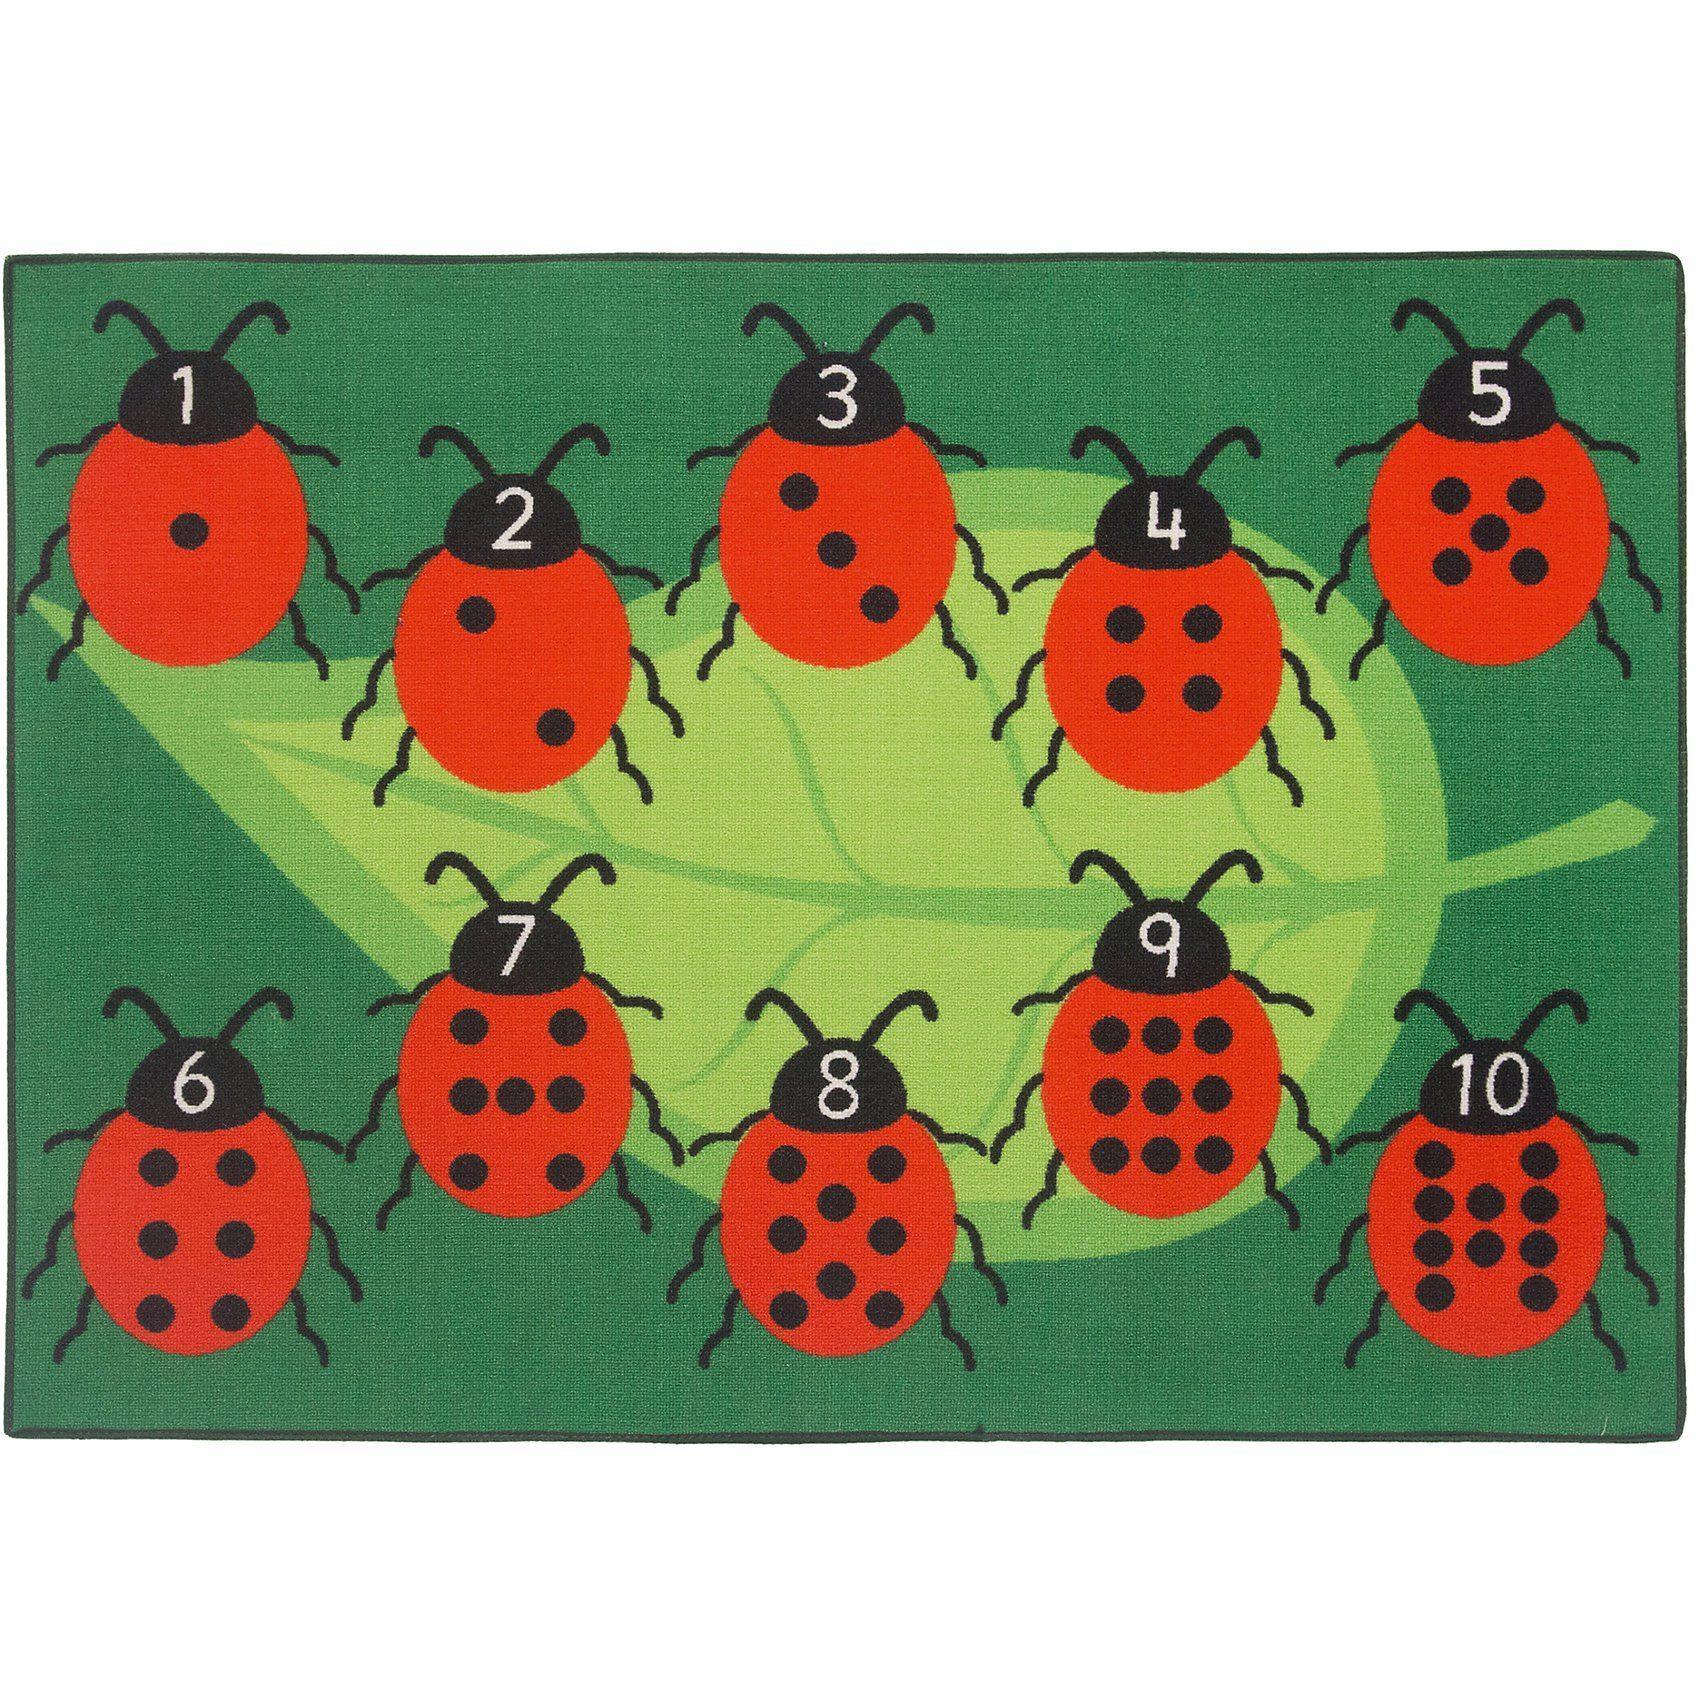 Kinderteppich Marienkäfer Ladybug, 95 x 133 cm